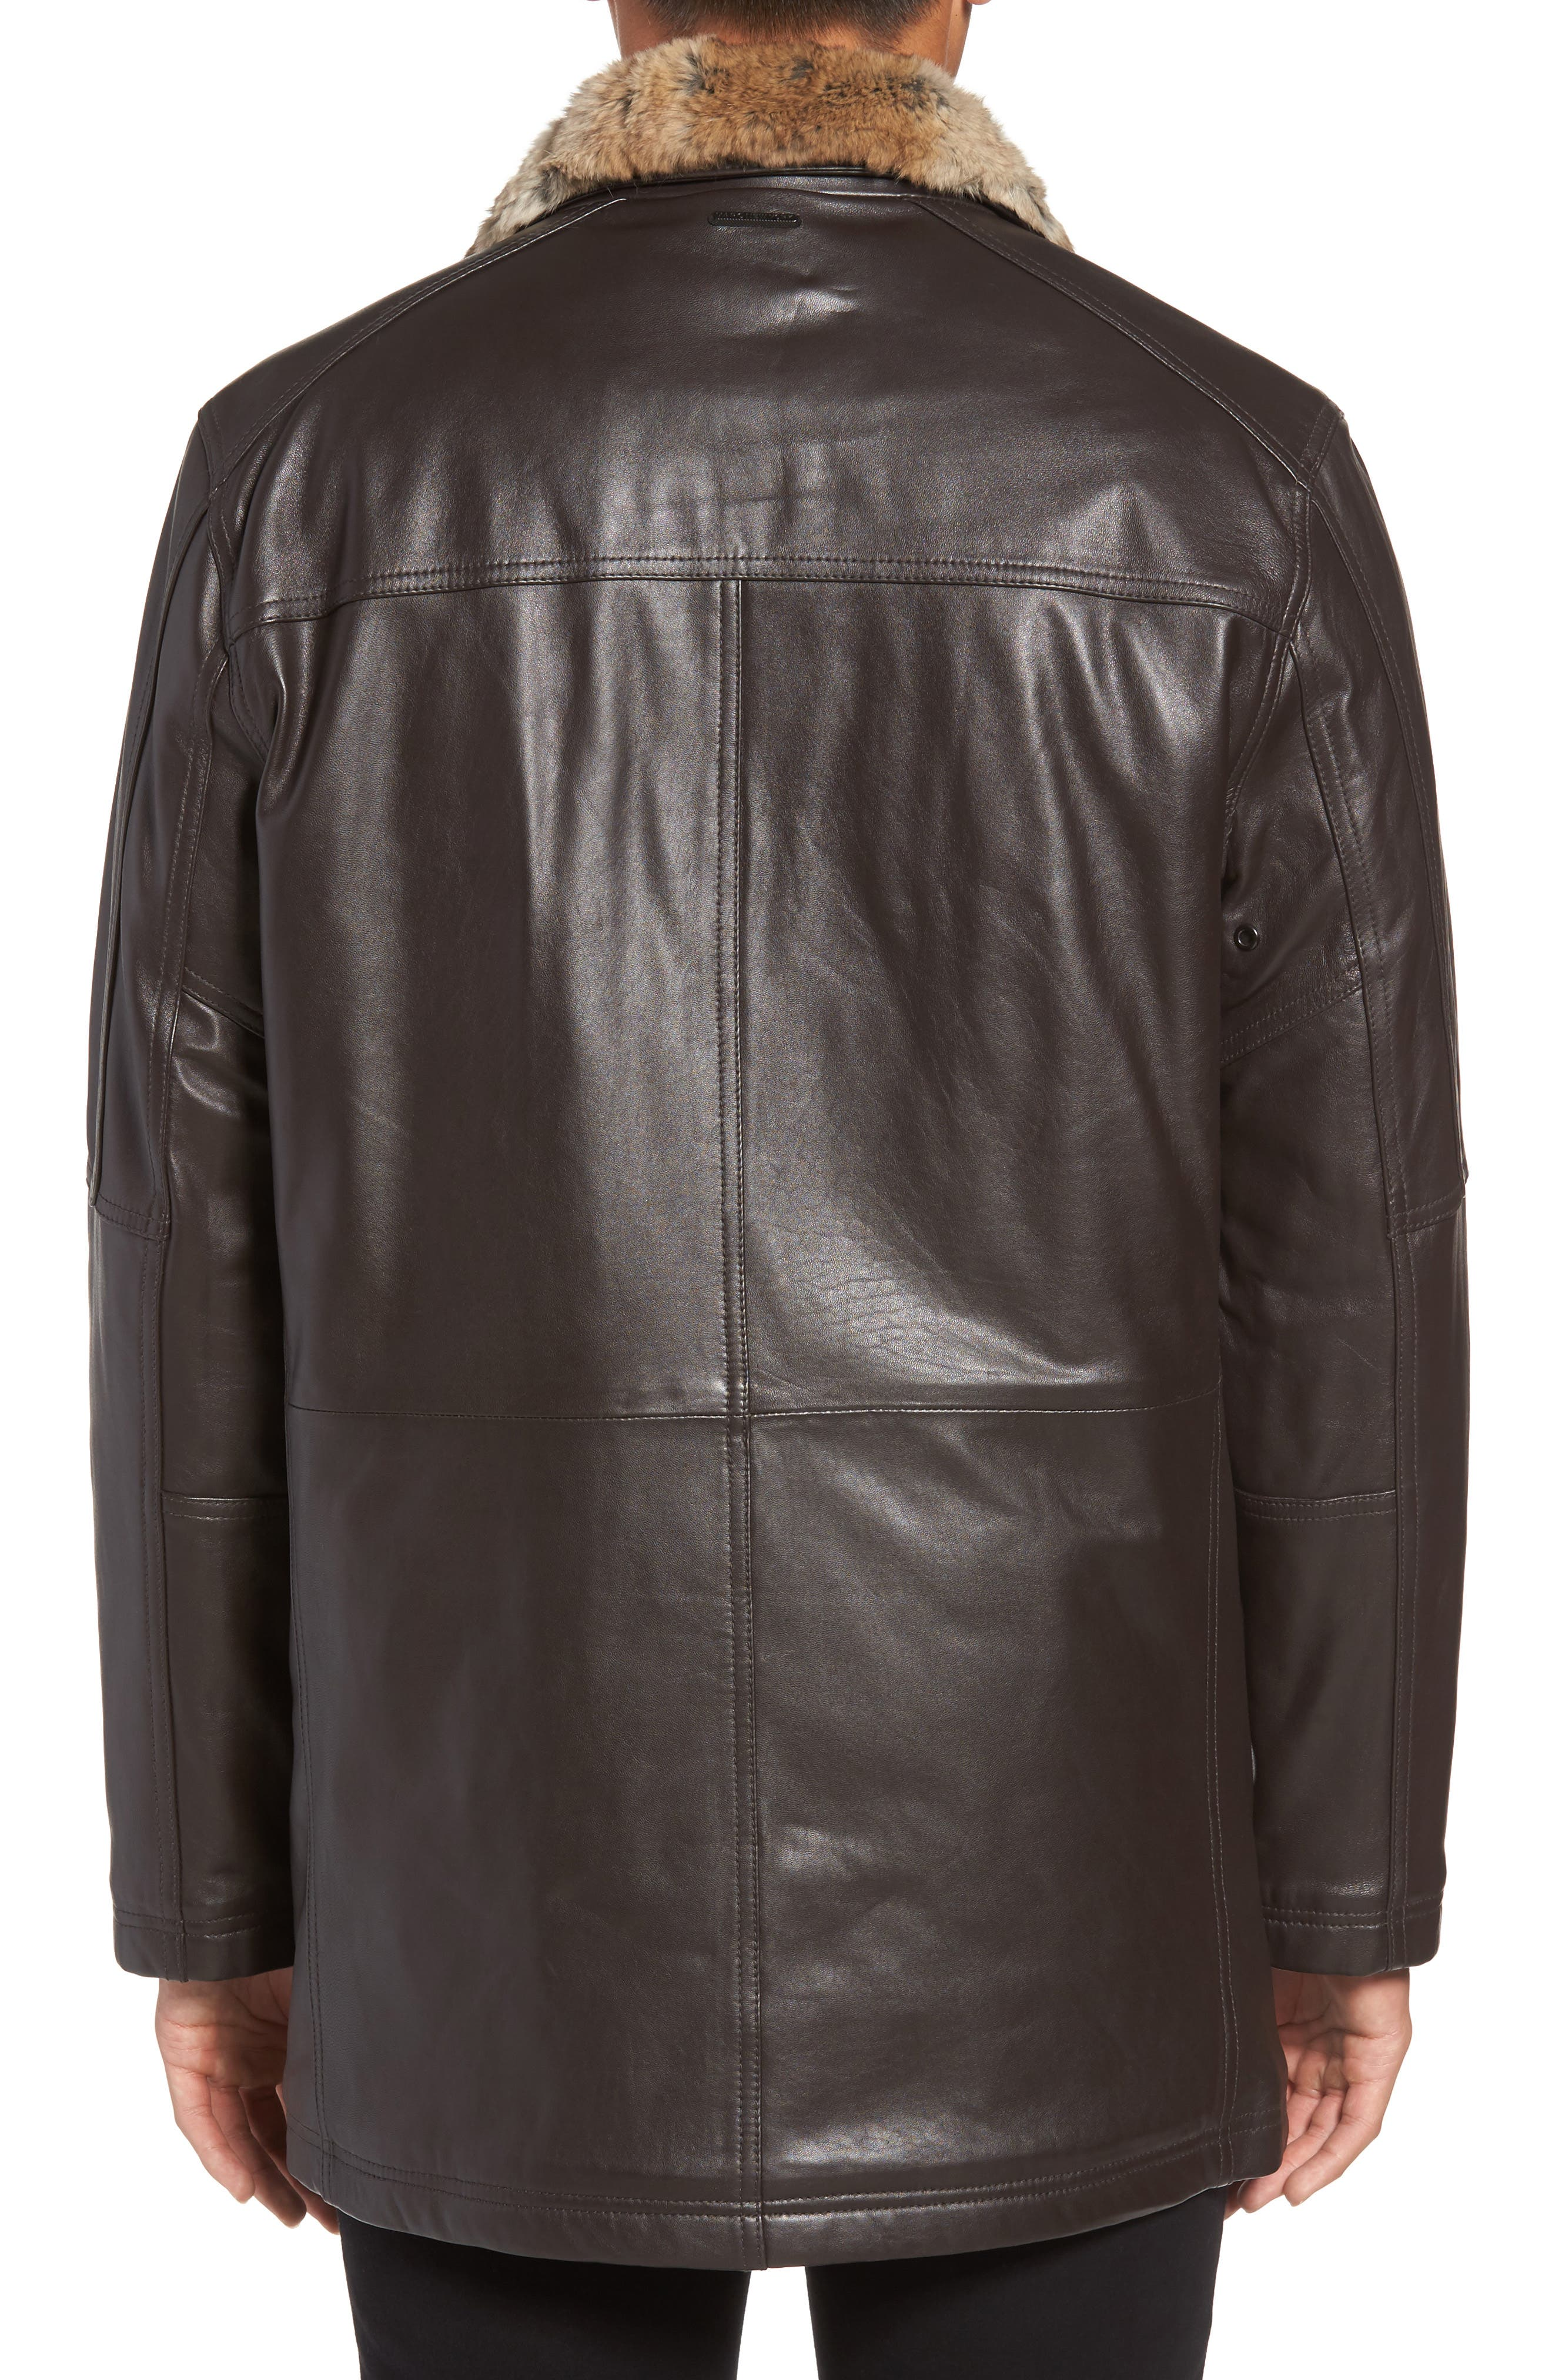 Middlebury Leather Car Coat with Genuine Rabbit Fur Trim,                             Alternate thumbnail 2, color,                             Espresso